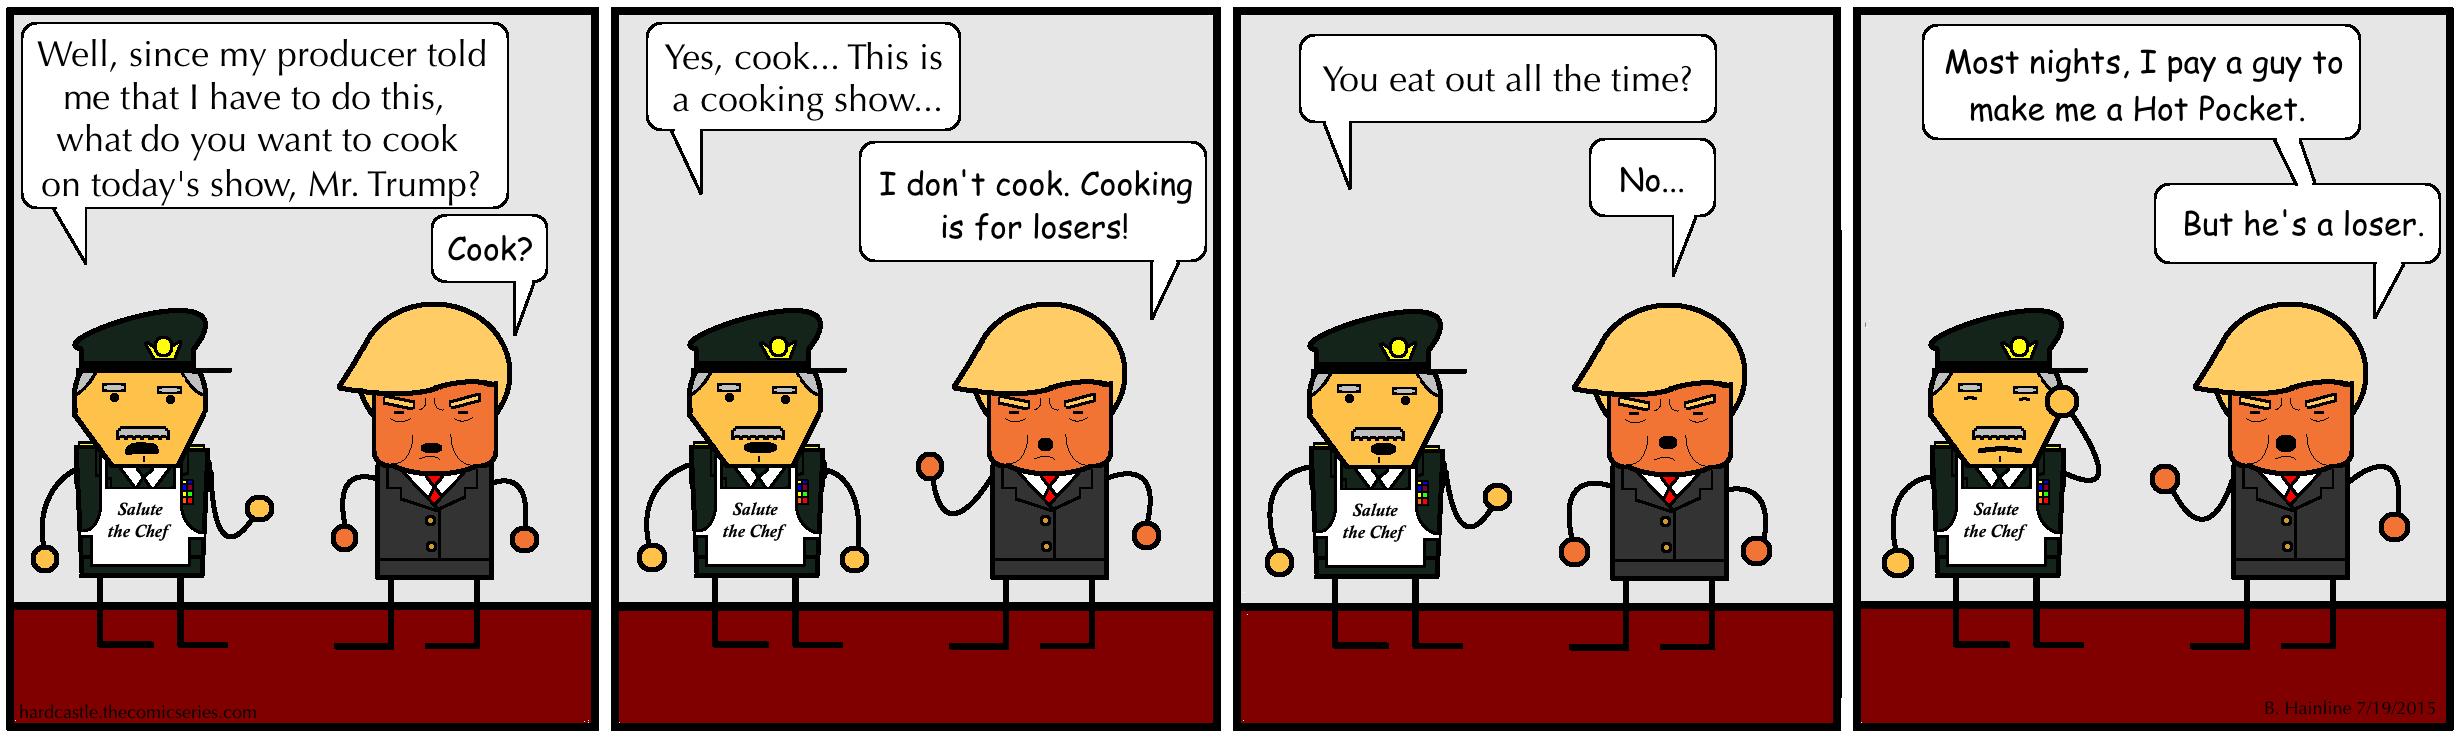 Cooking Alternative